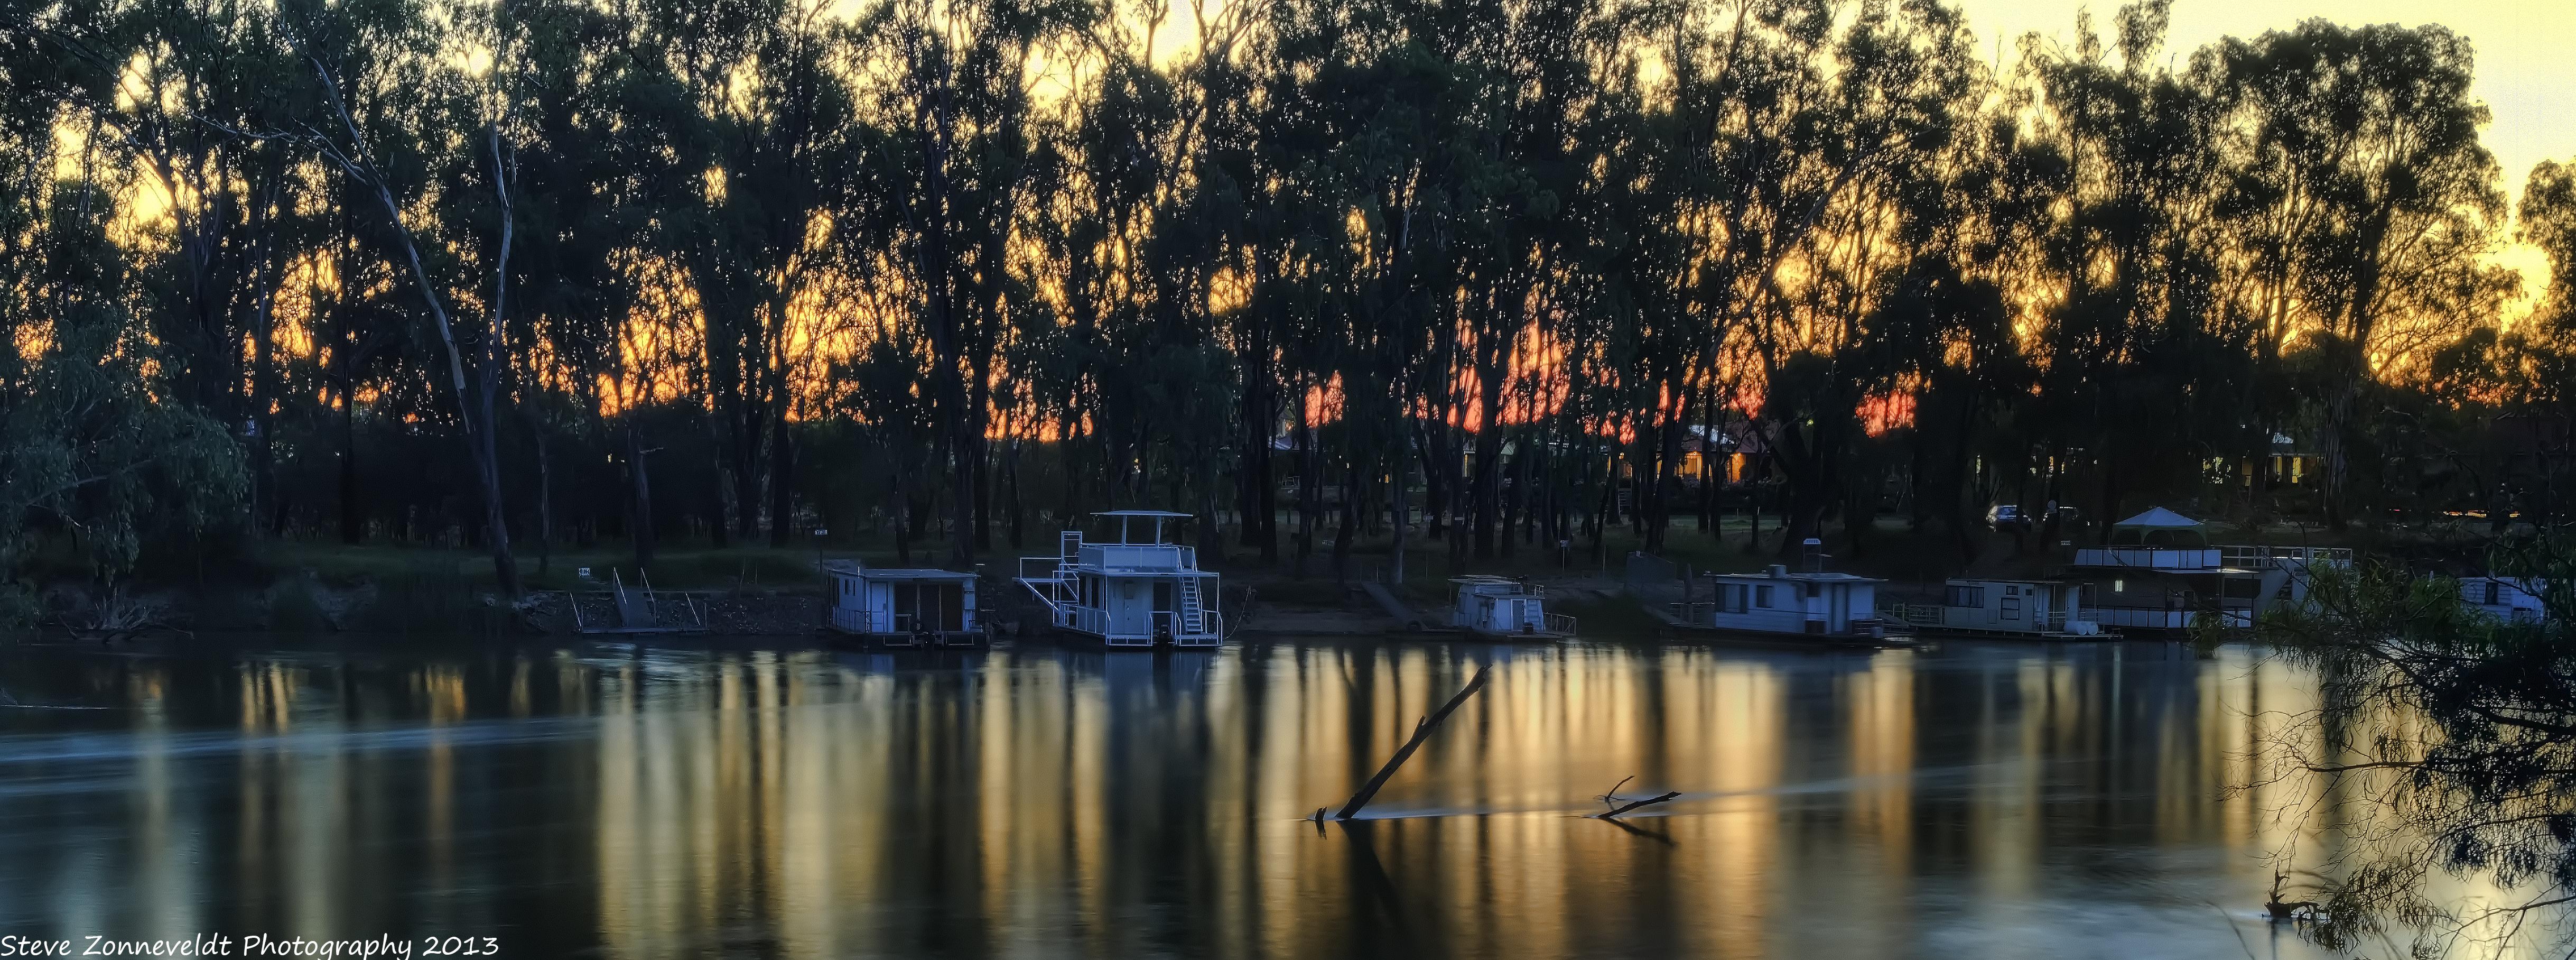 House Boats by djzontheball